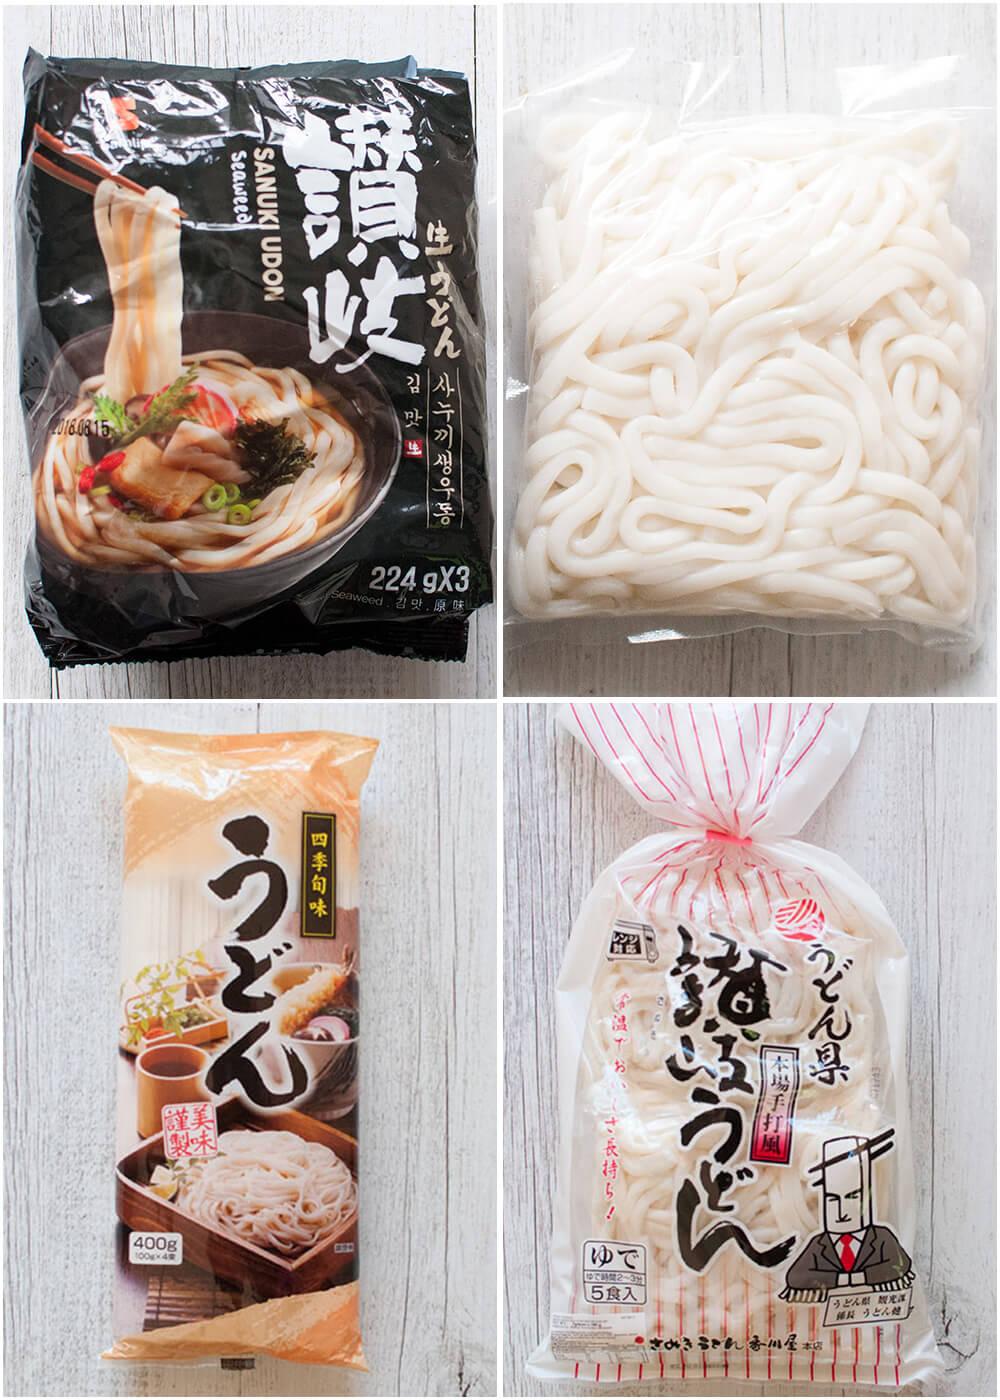 Varieties of udon noodles